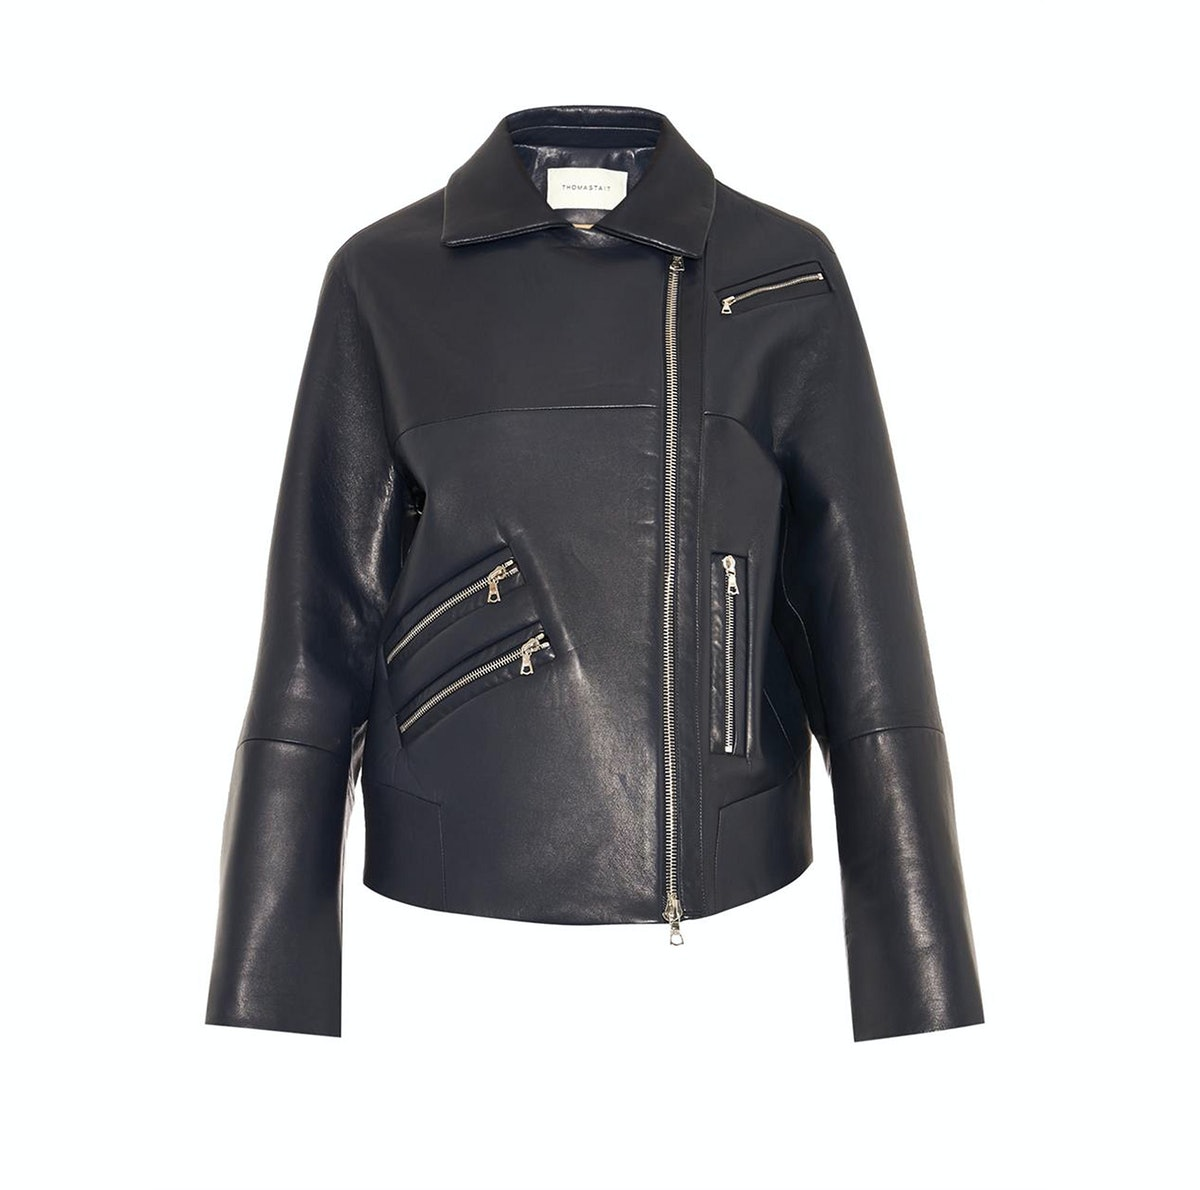 Thomas Tait jacket